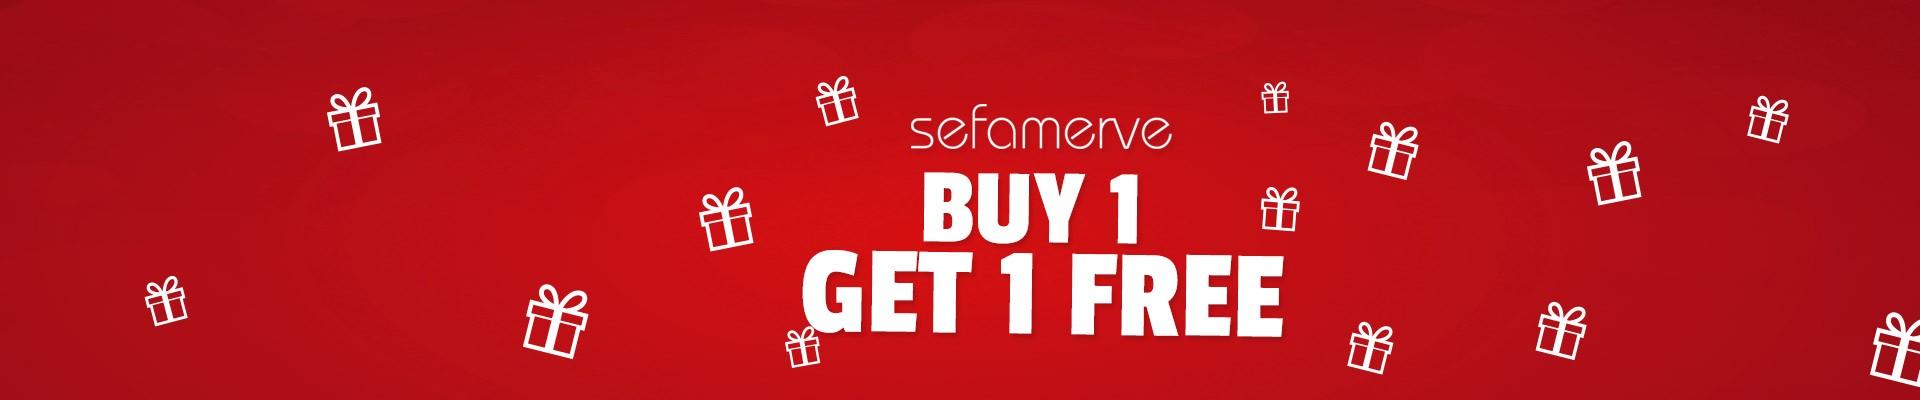 Buy 1 Get 1 Free